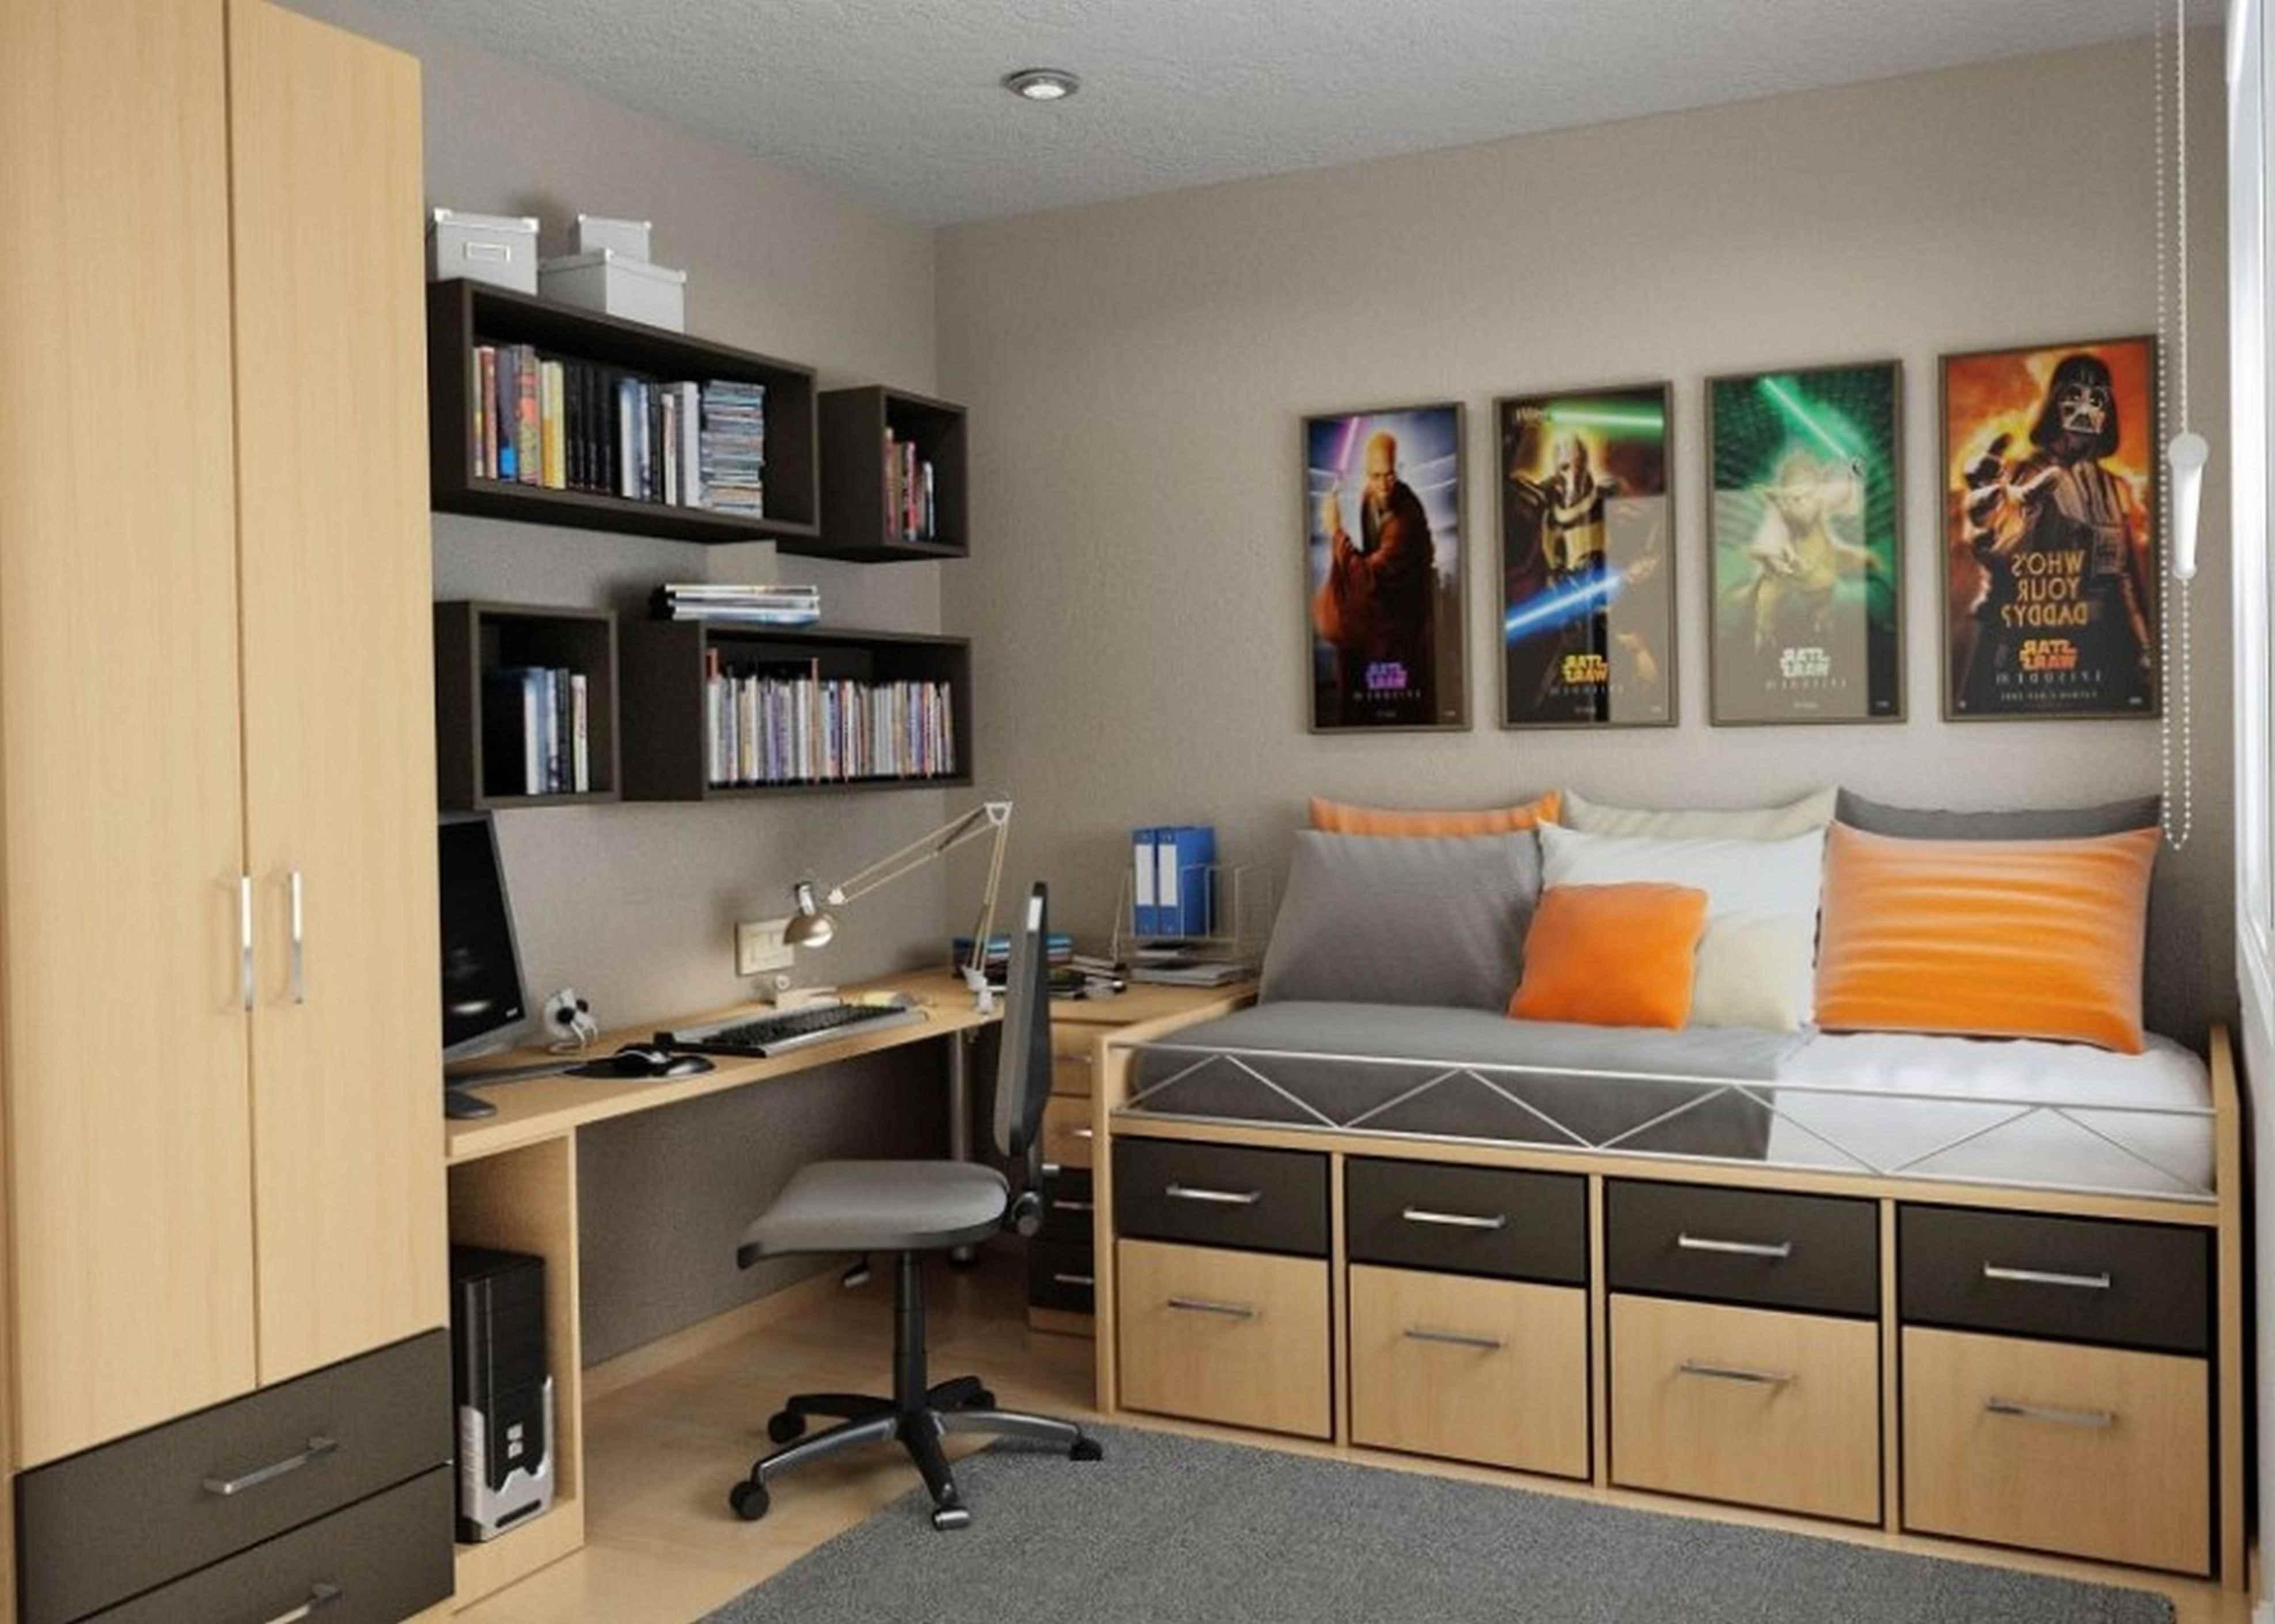 10 Beautiful Cool Room Ideas For Teenage Guys bedroom ideas teenage guys lovely bedroom bedroom design cool ideas 2020